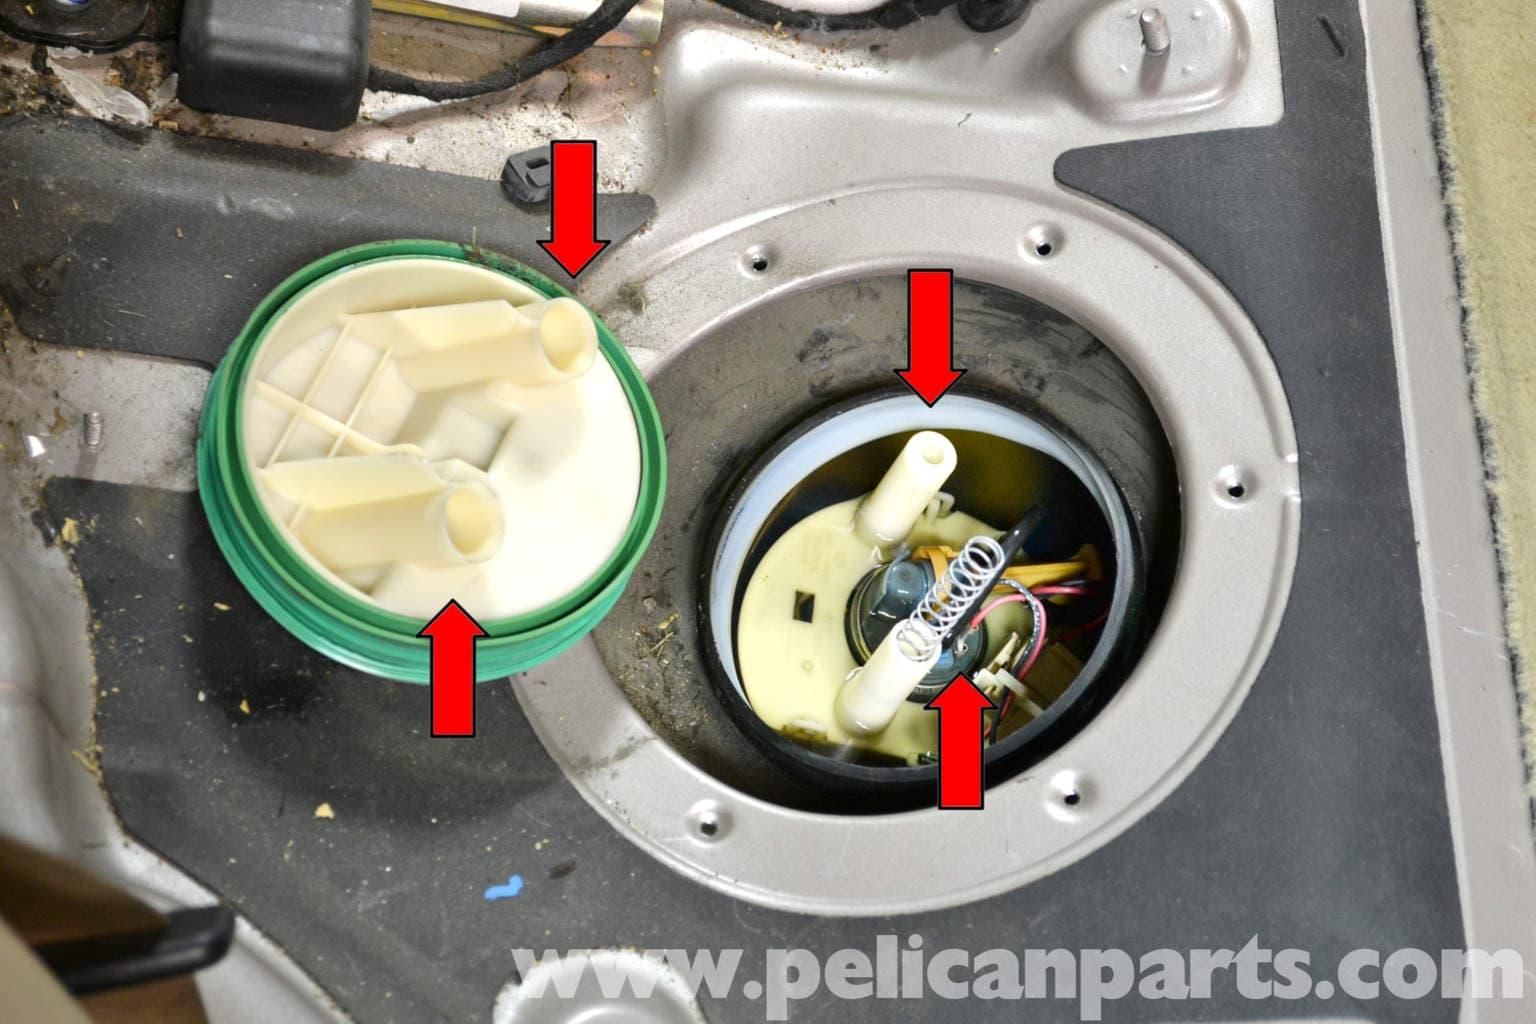 2007 Ford E350 Fuse Panel Diagram Mercedes Benz W203 Fuel Pump Replacement 2001 2007